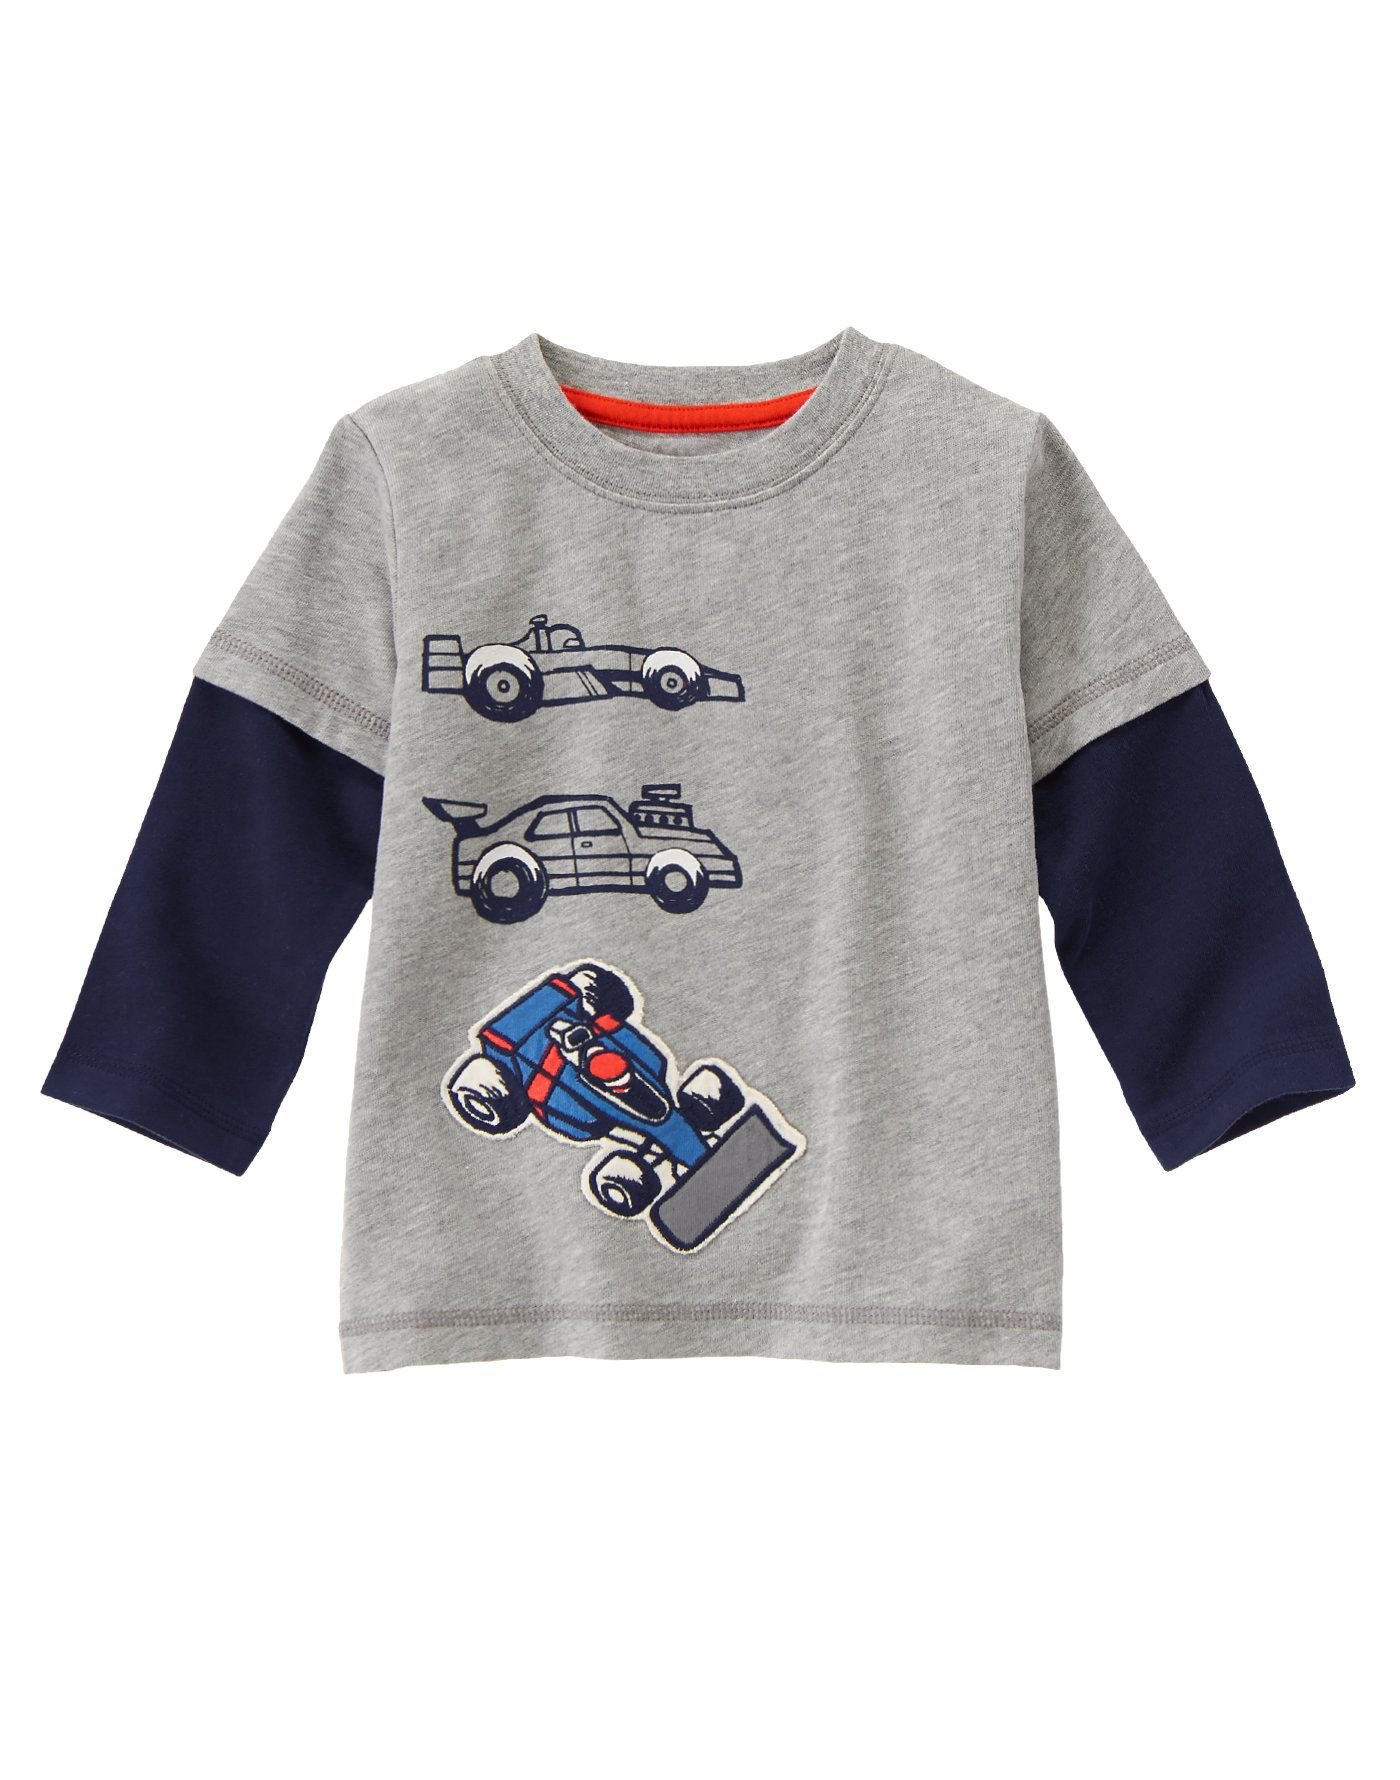 aca7f18918 Race Cars Long Sleeve Tee at Gymboree | Boys | Boys t shirts, Long ...